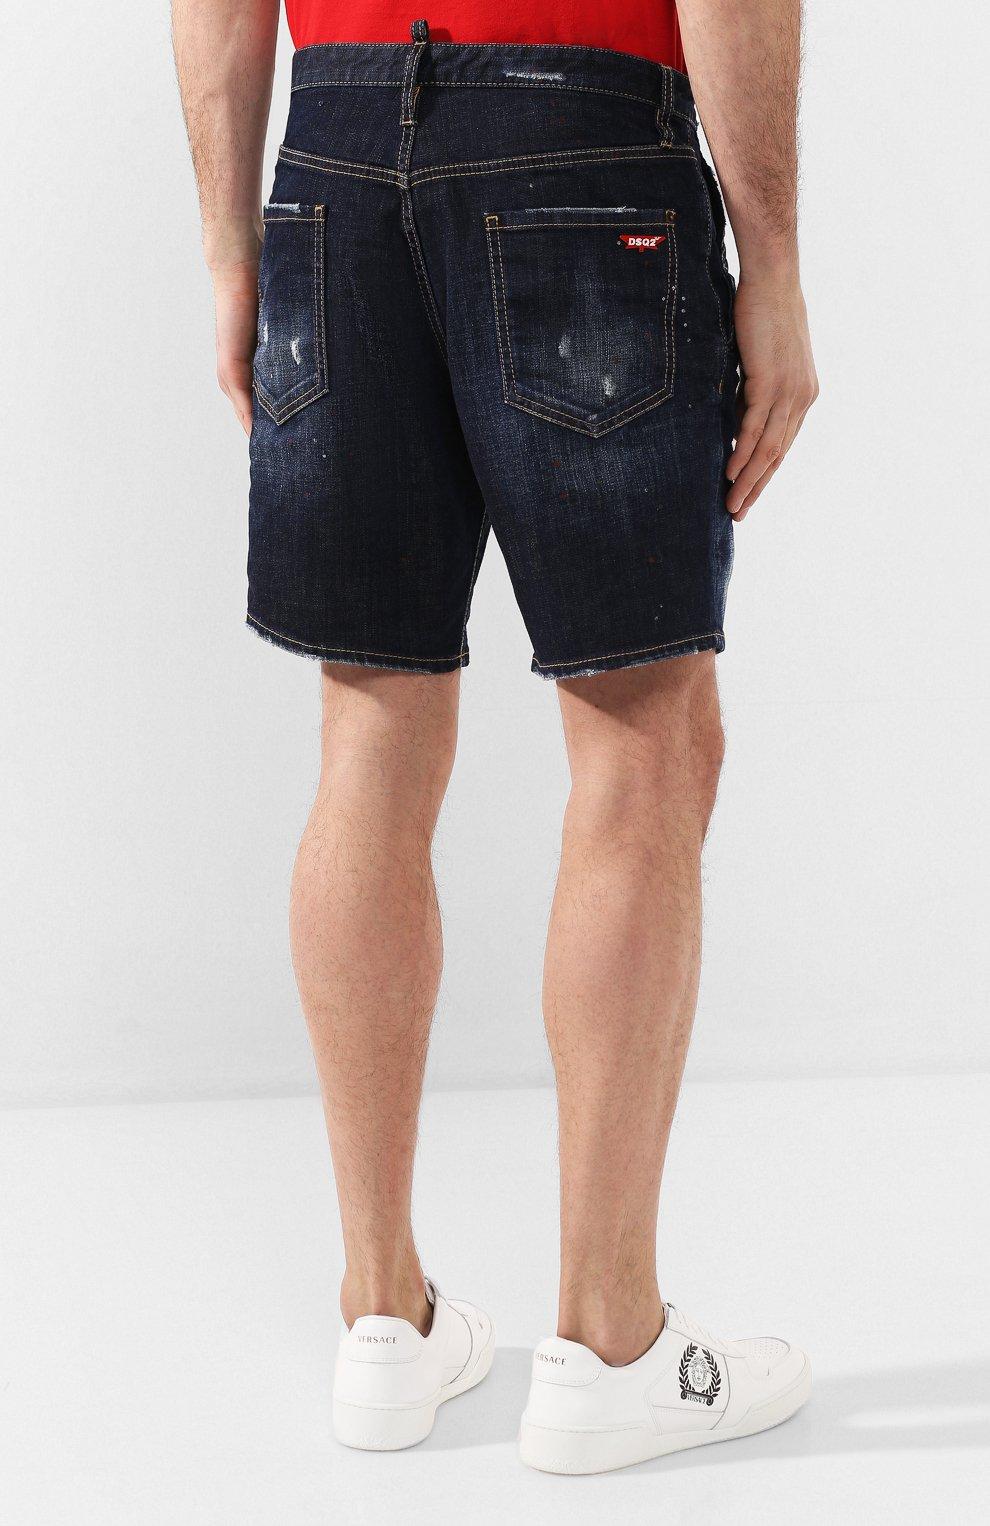 Мужские джинсовые шорты DSQUARED2 темно-синего цвета, арт. S74MU0576/S30664   Фото 4